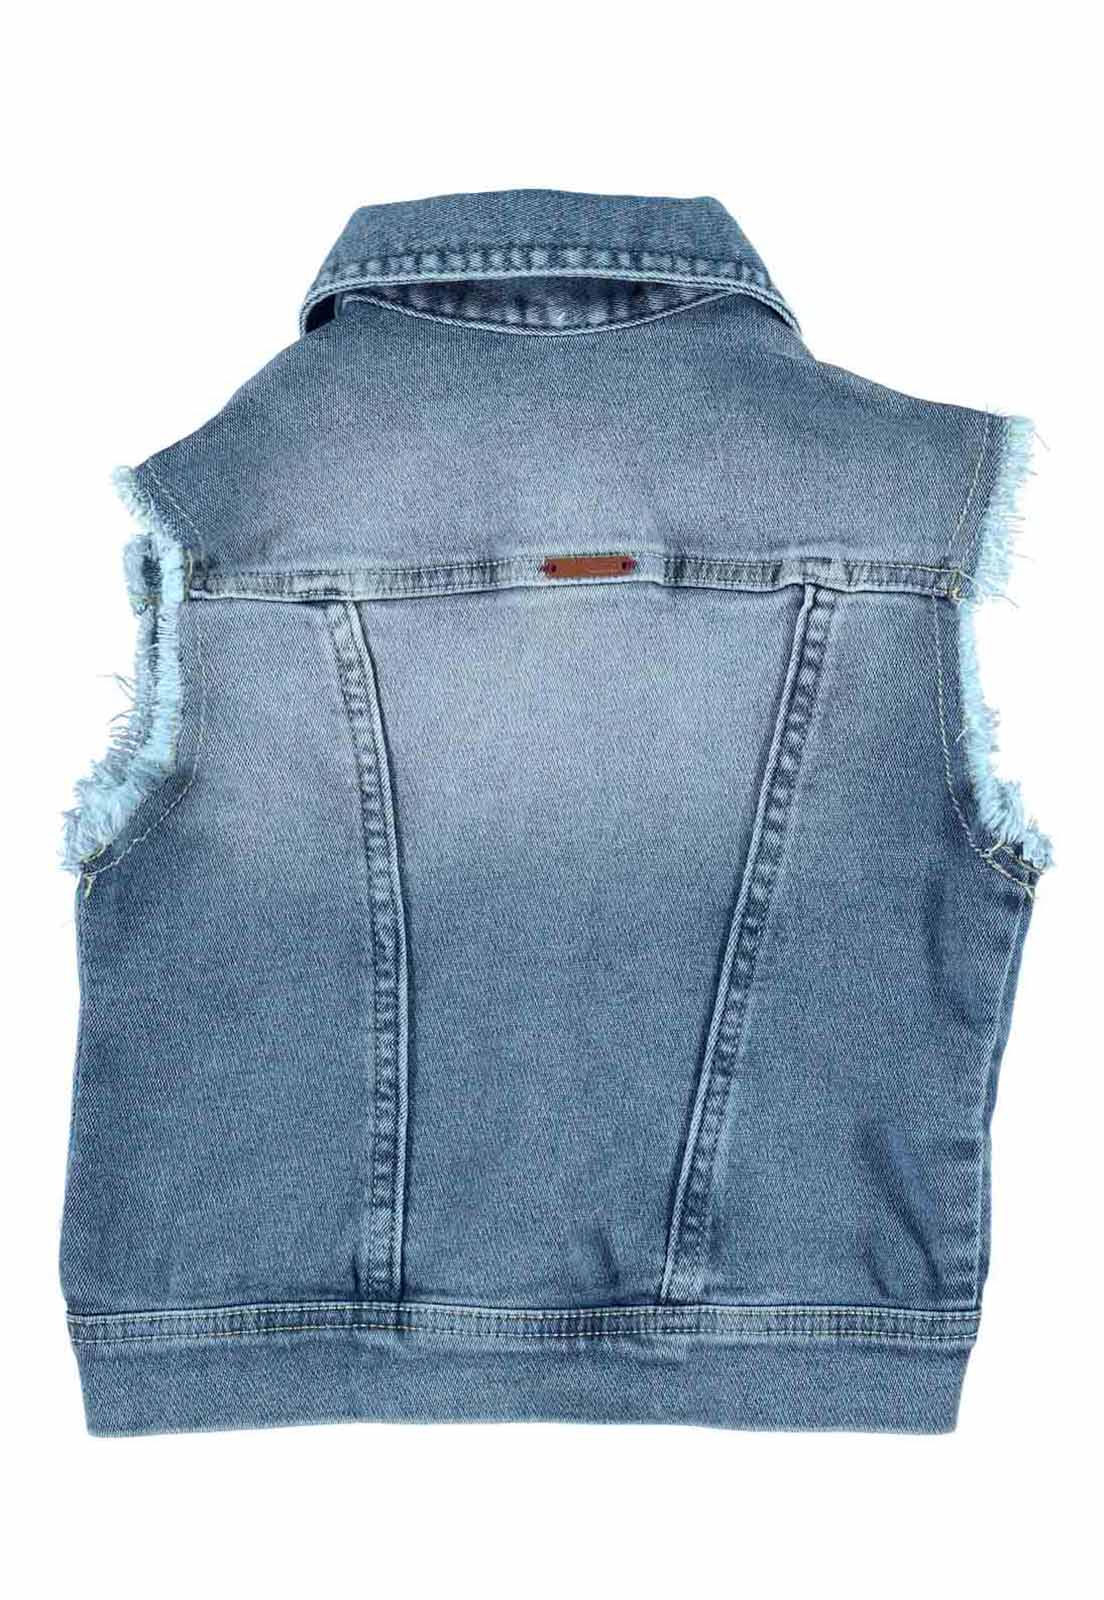 Colete Feminino Crawling Jeans Moletom